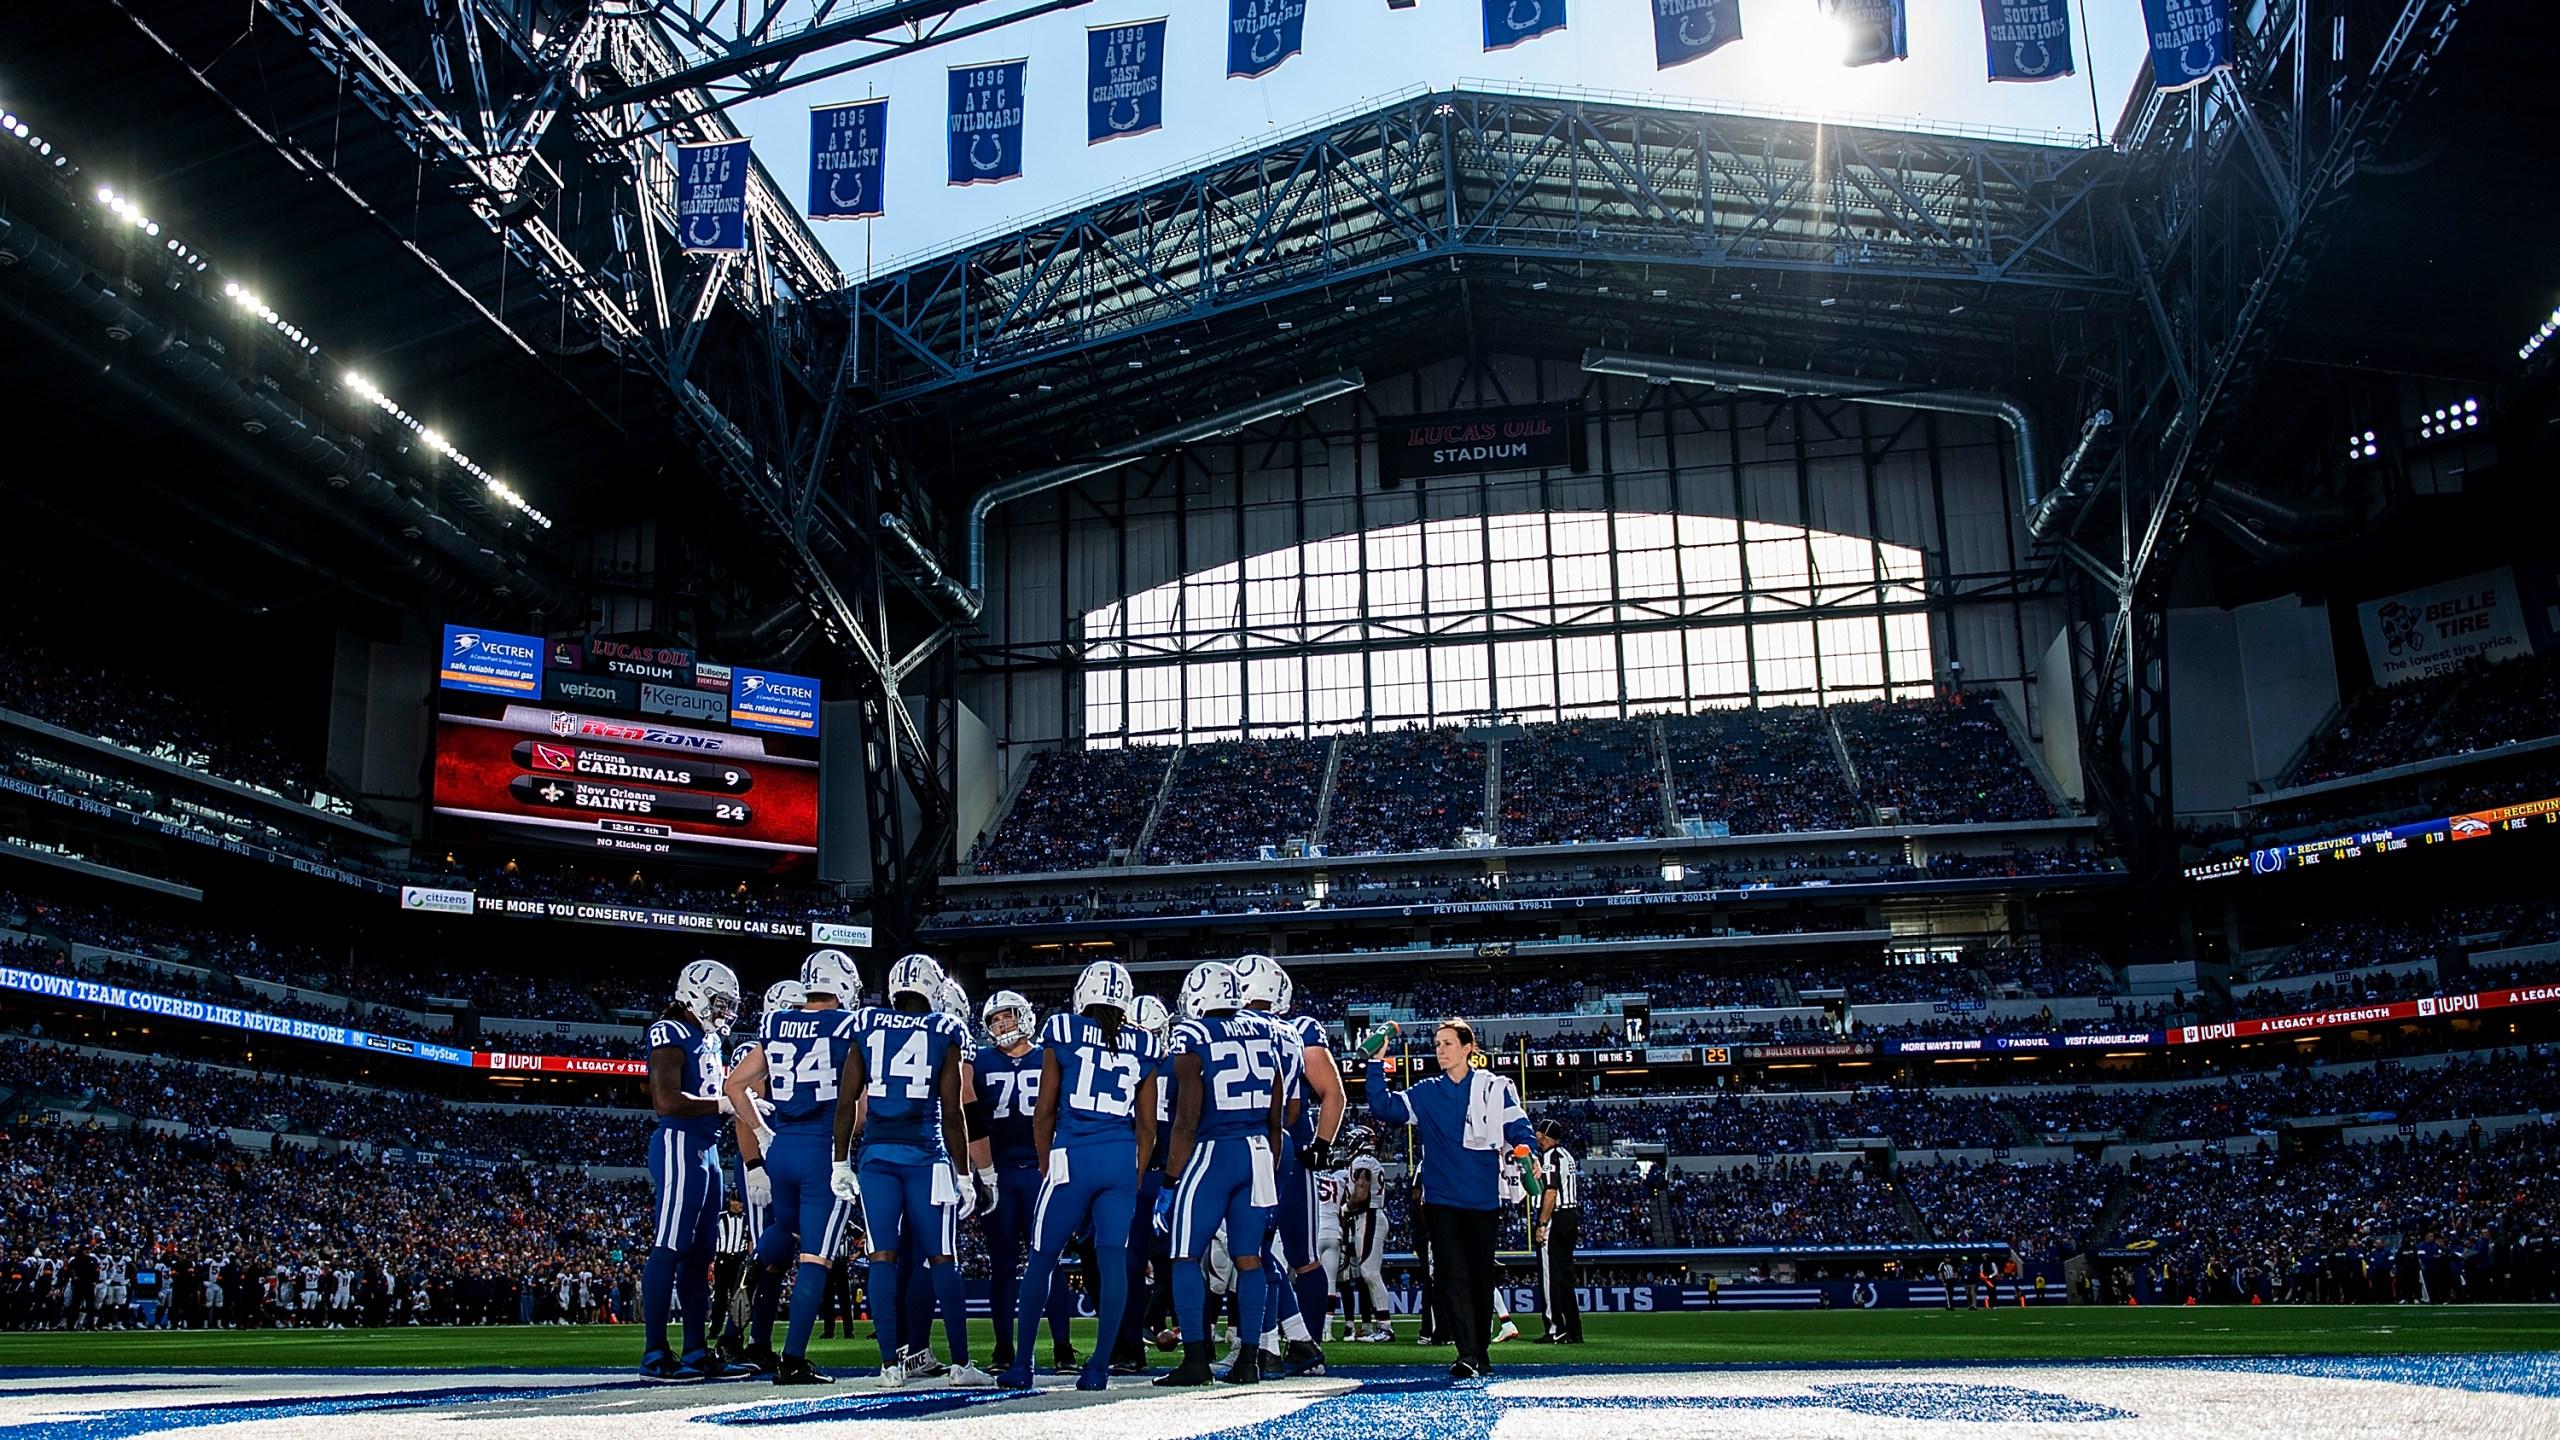 Indianapolis Colts at Lucas Oil Stadium